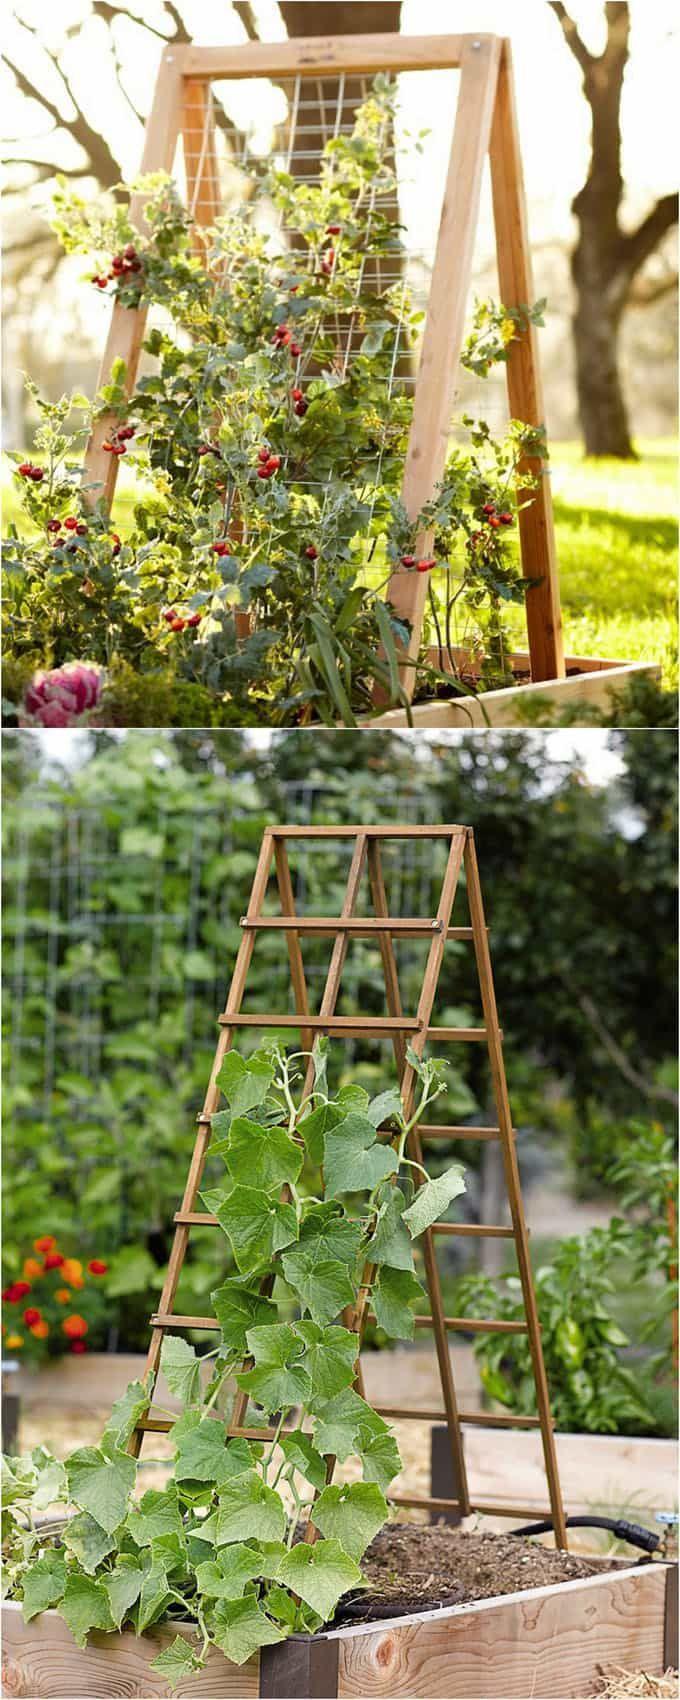 21 Easy Diy Trellis & Vertical Garden Structures  Page 2 Of 3